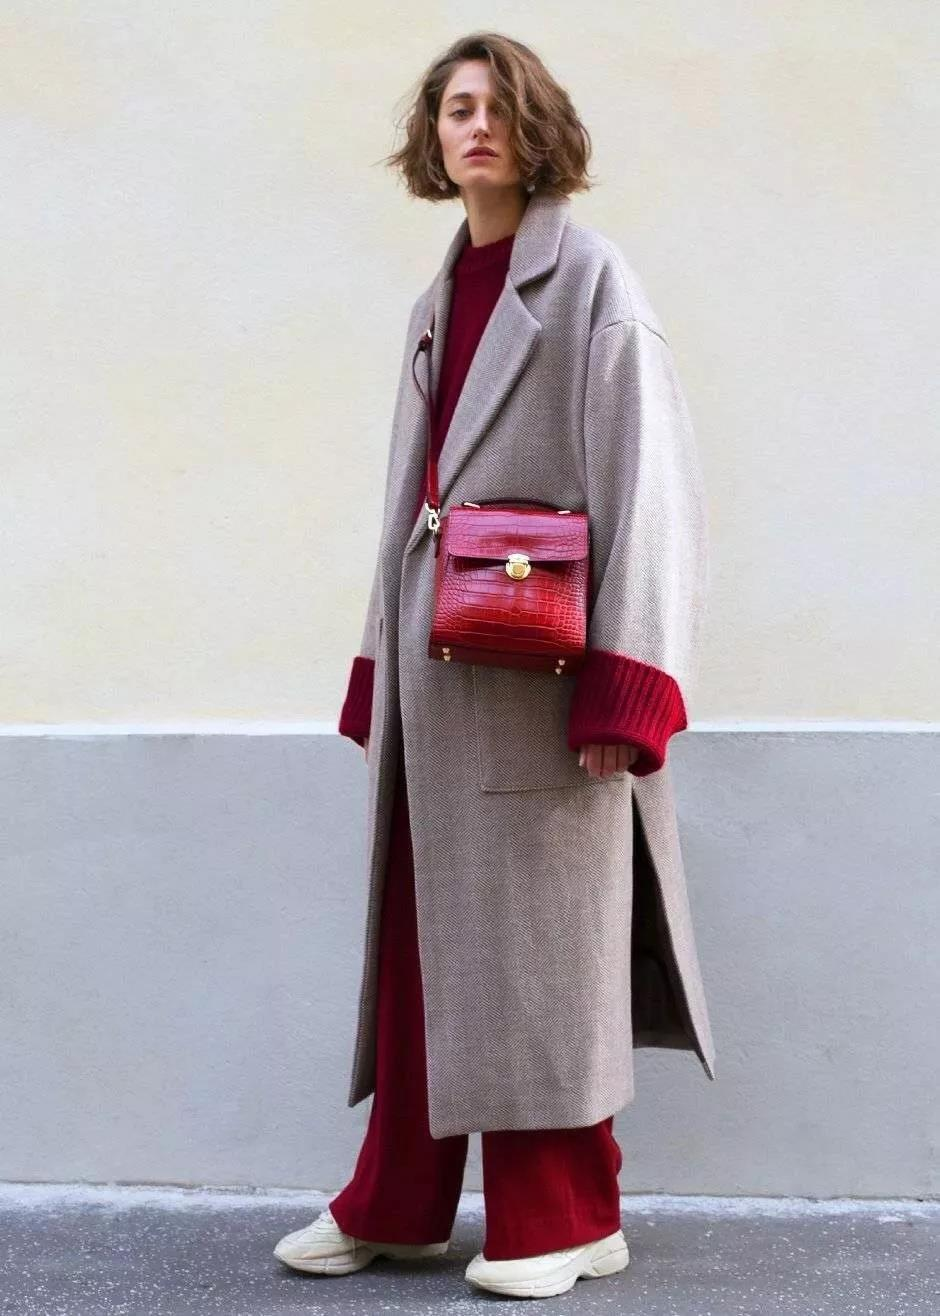 Classic burgundy pants with grey coat